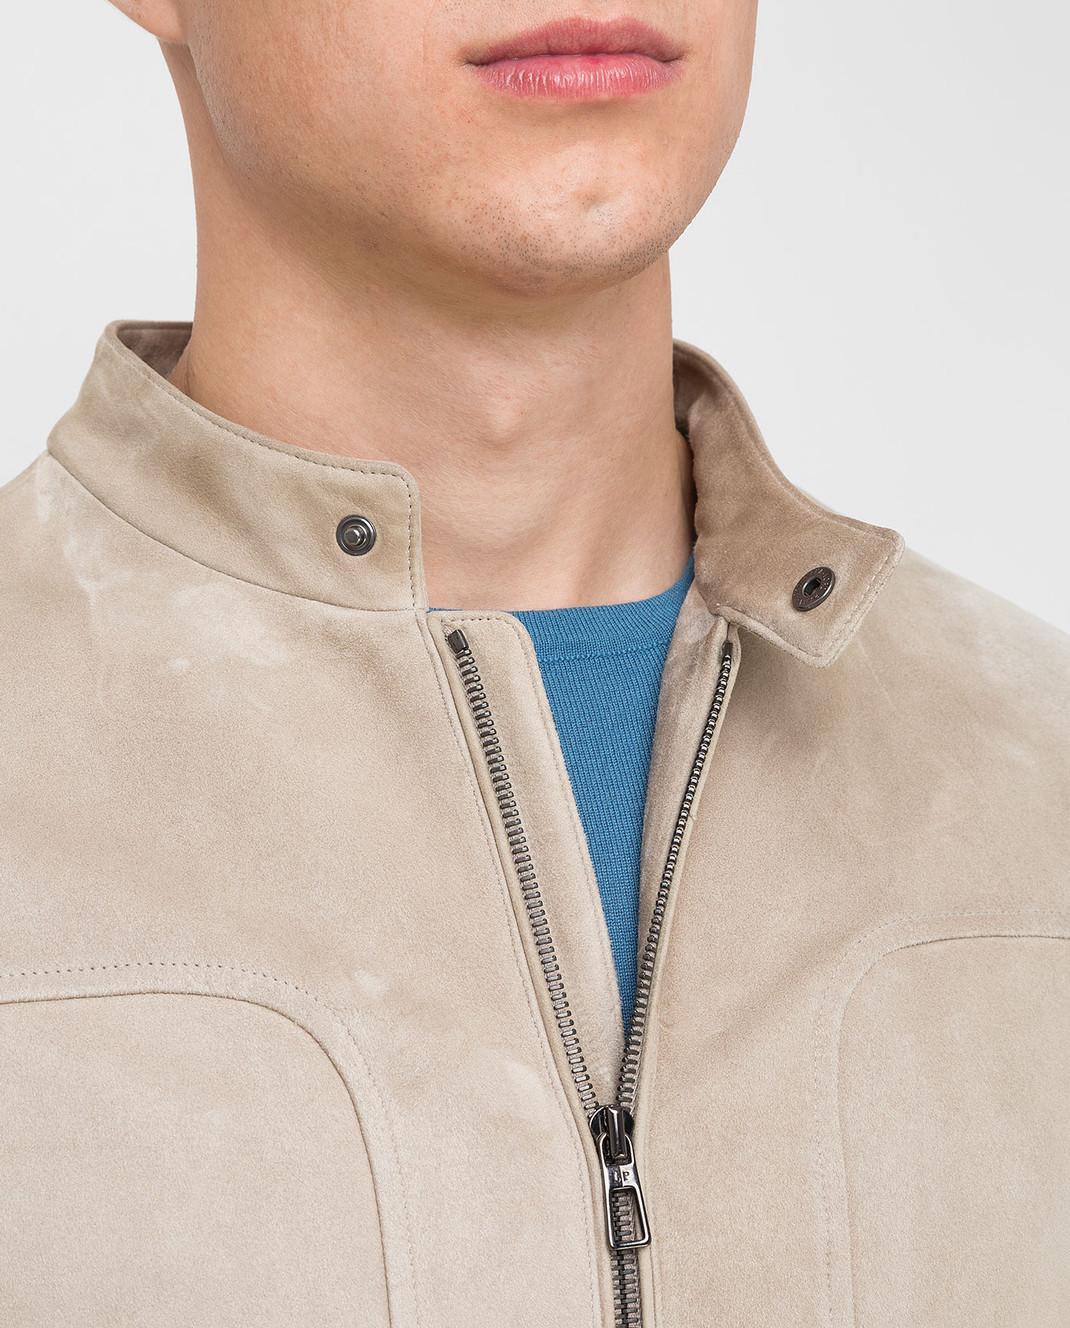 Loro Piana Светло-бежевая замшевая куртка F1FAG1790 изображение 5